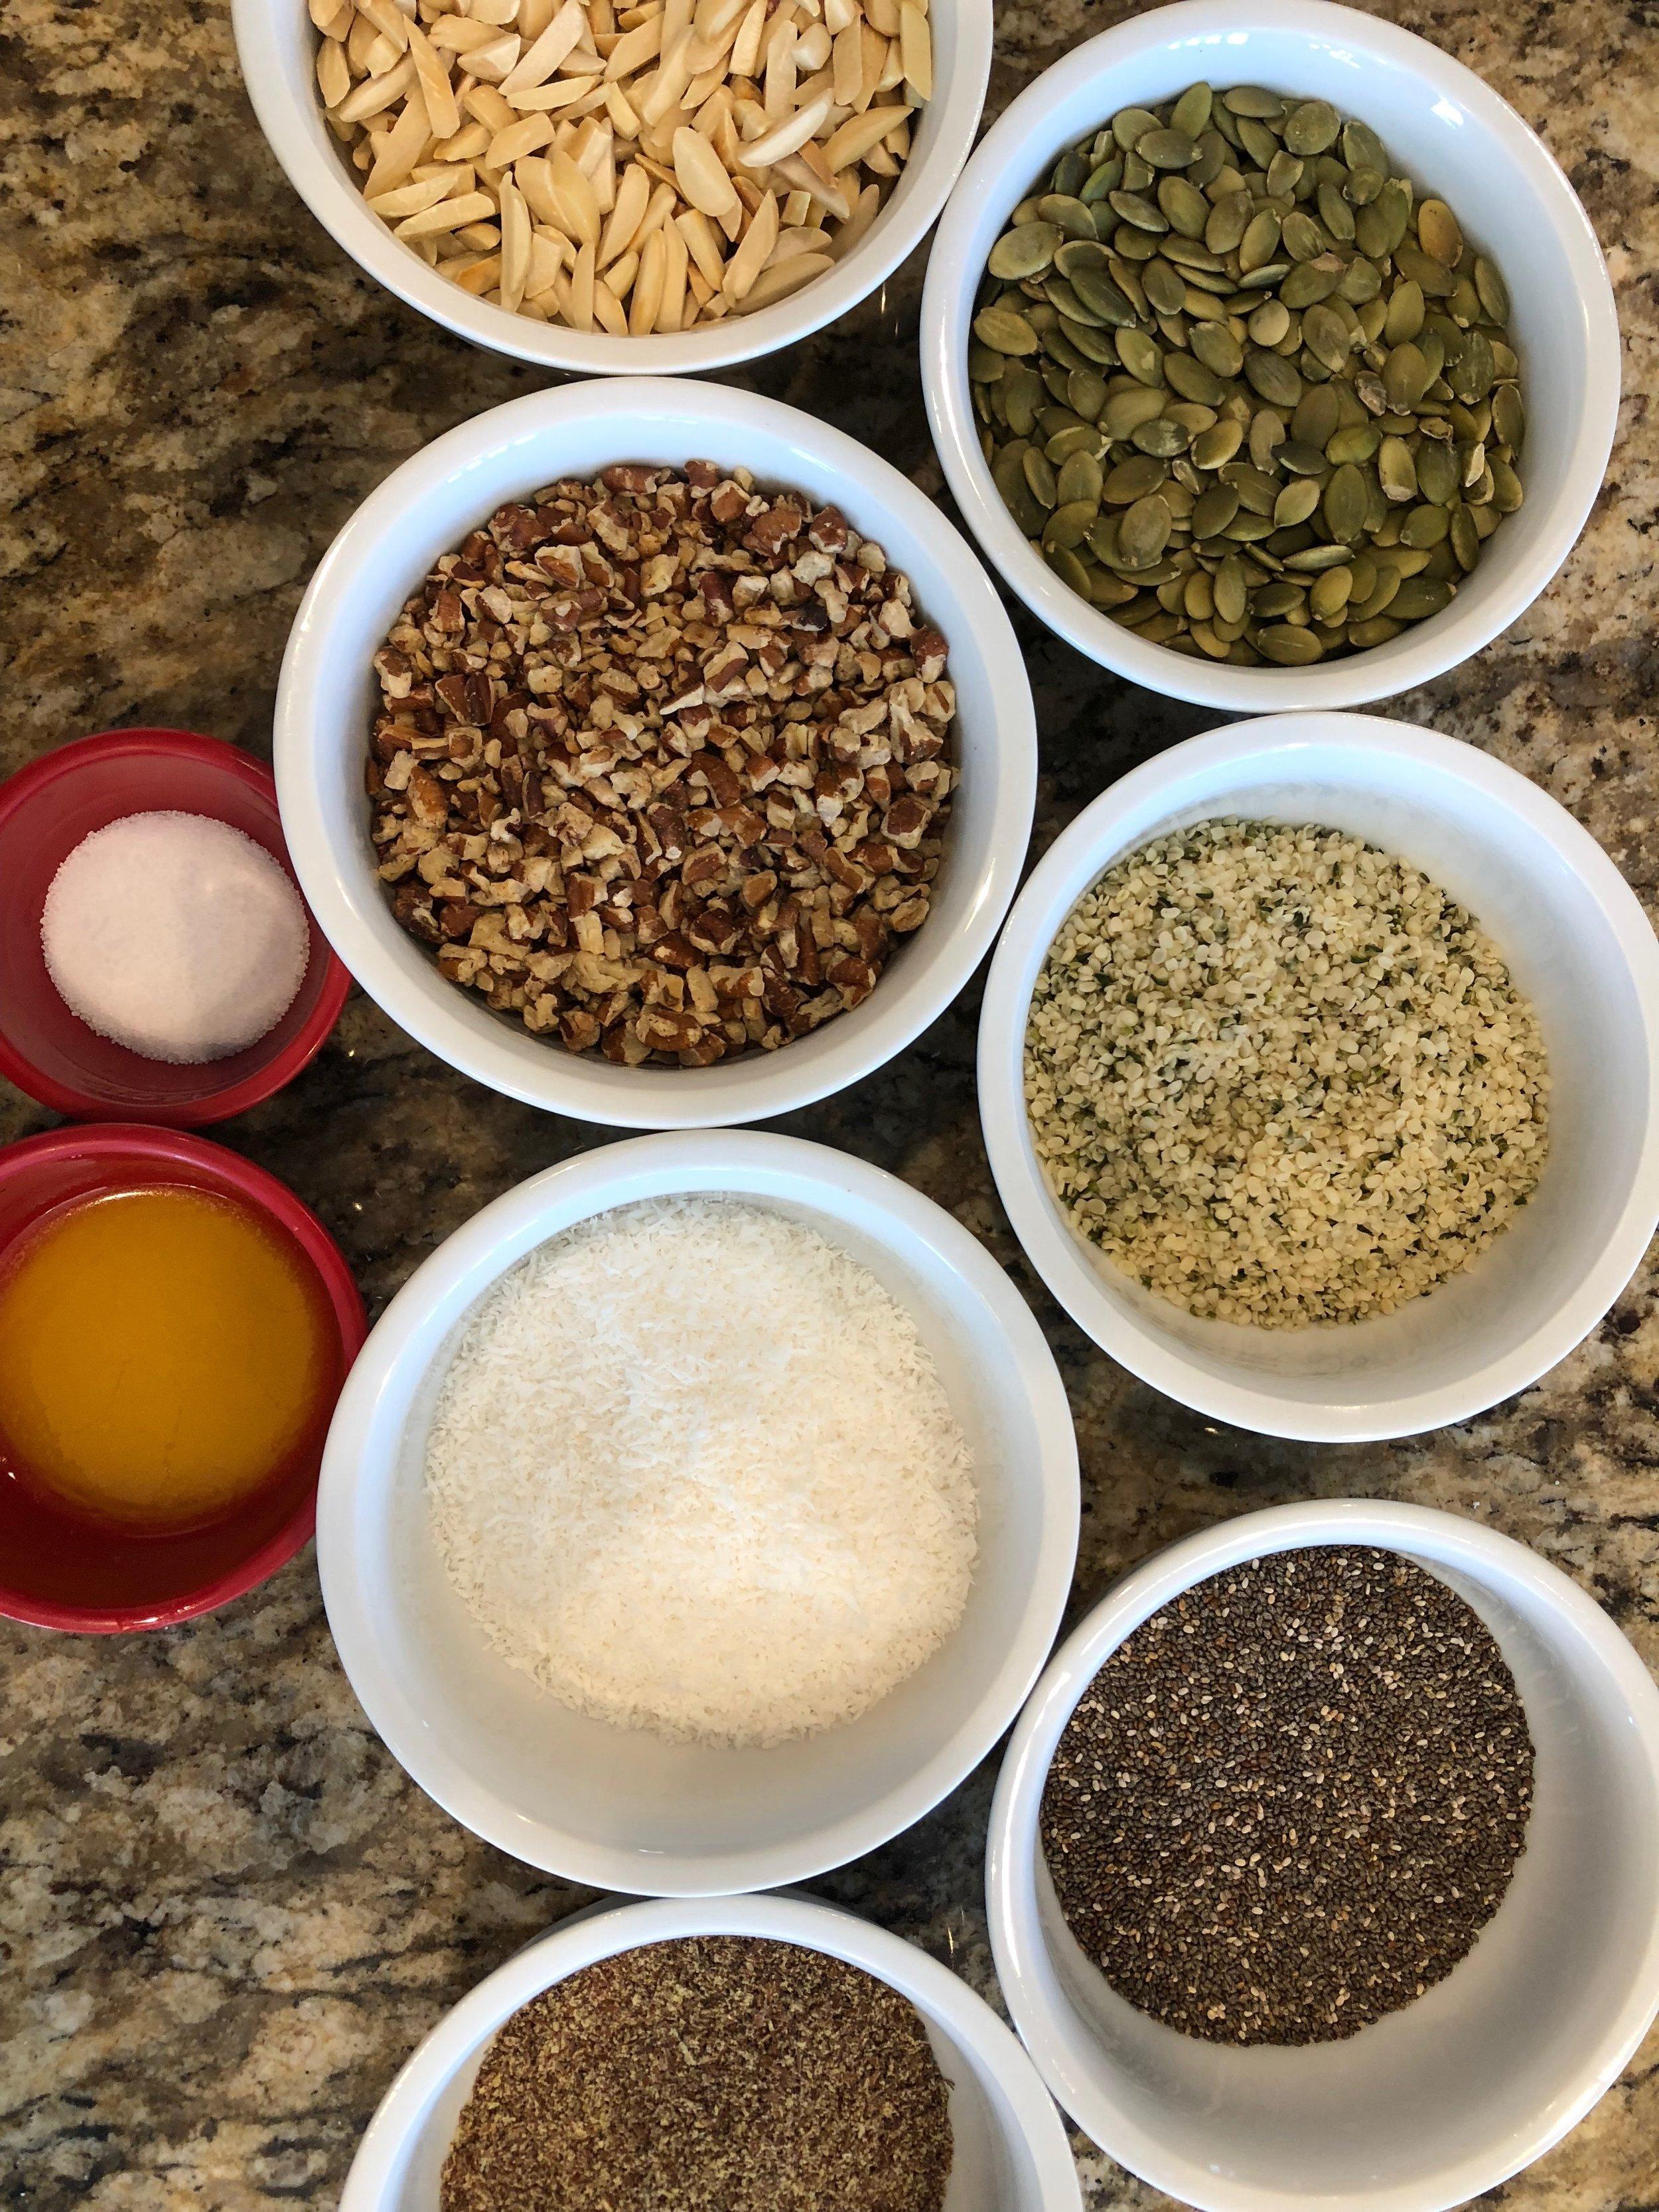 Keto Granola Ingredients